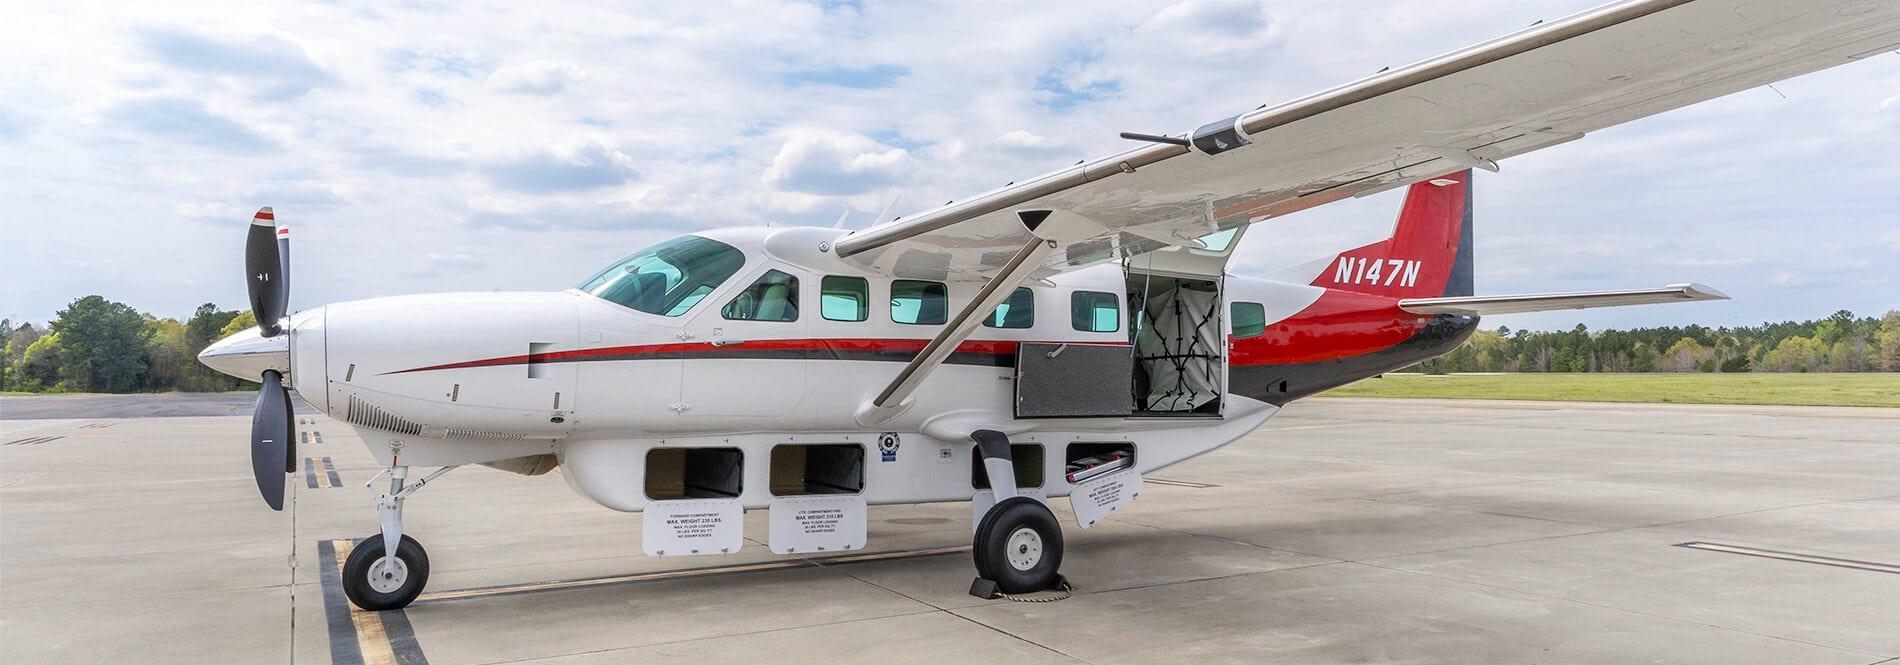 Cessna Caravan Exterior with Cargo Bays Open